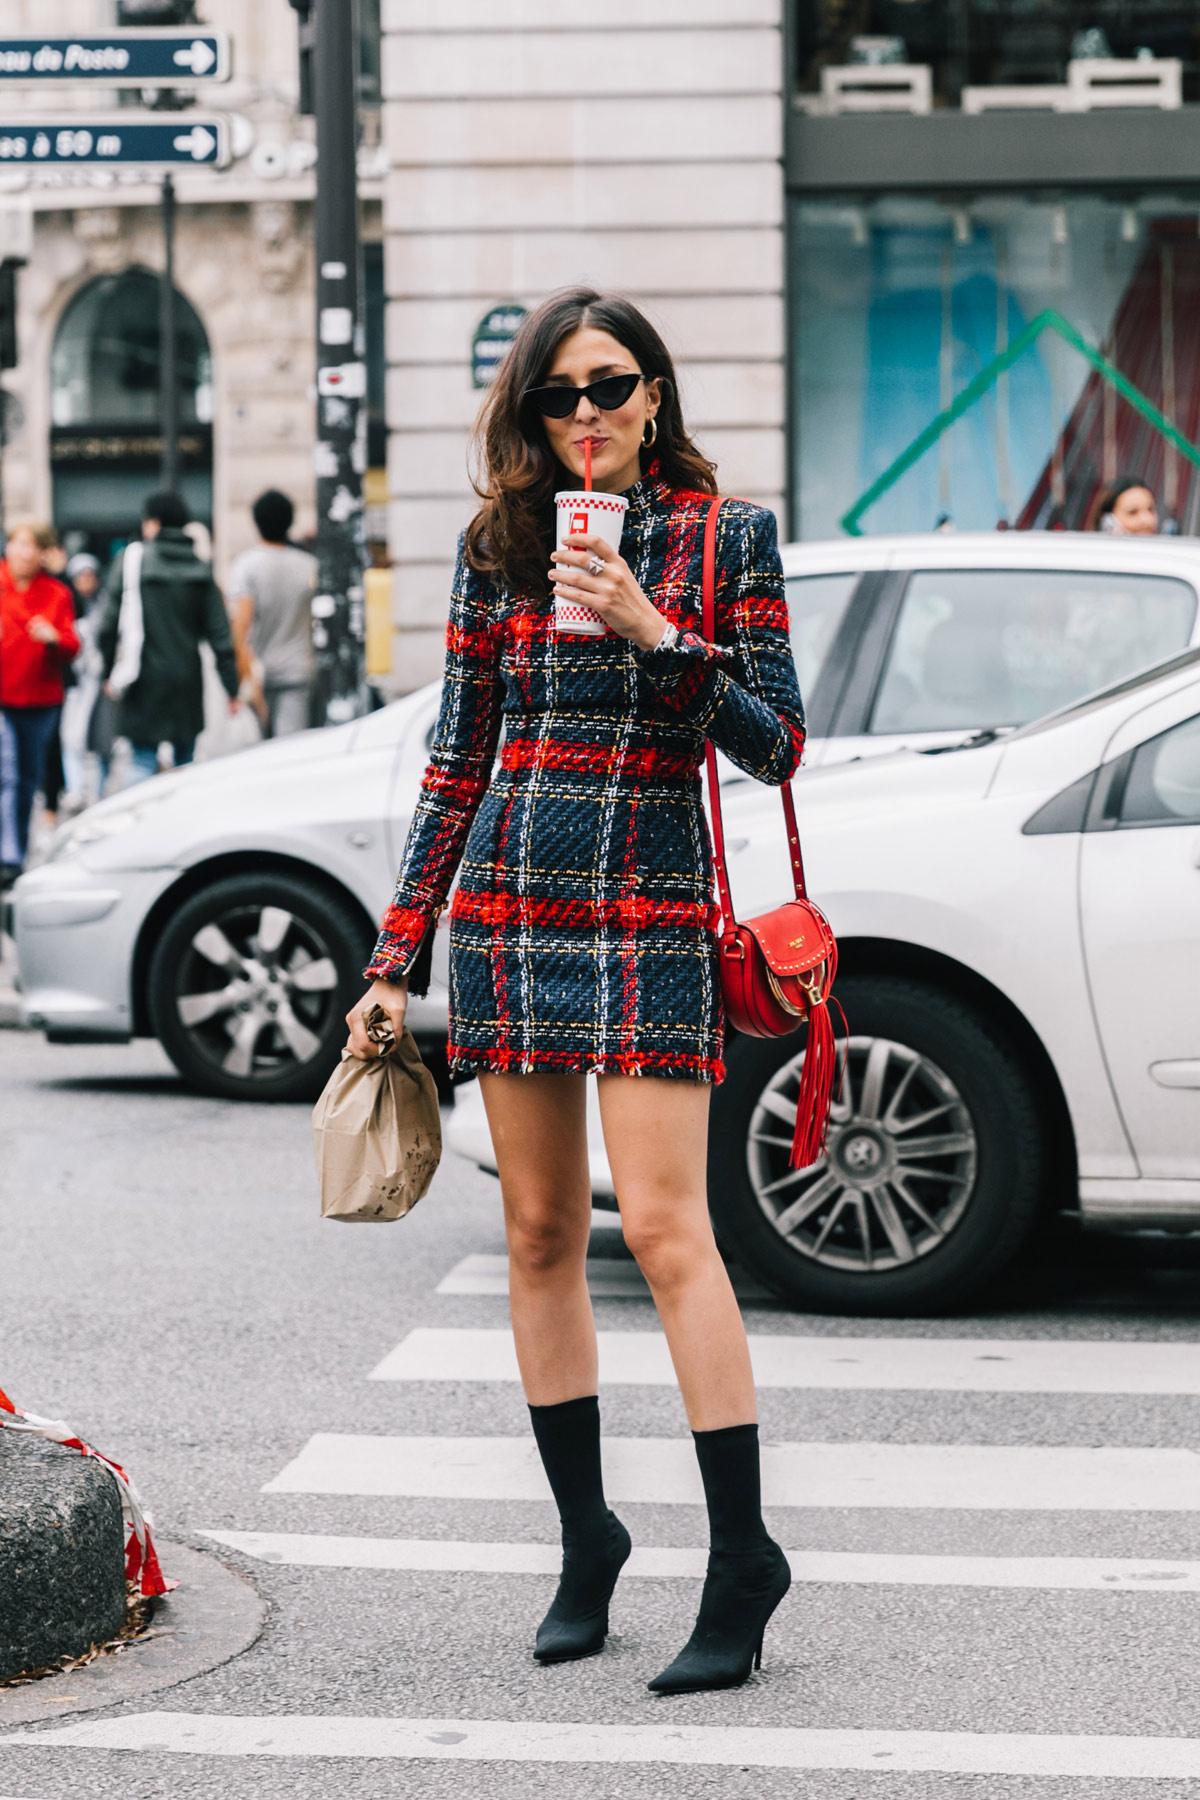 street_style_paris_fashion_week_dia3_balmain_chloe_isabel_maran_418282886_1200x1800